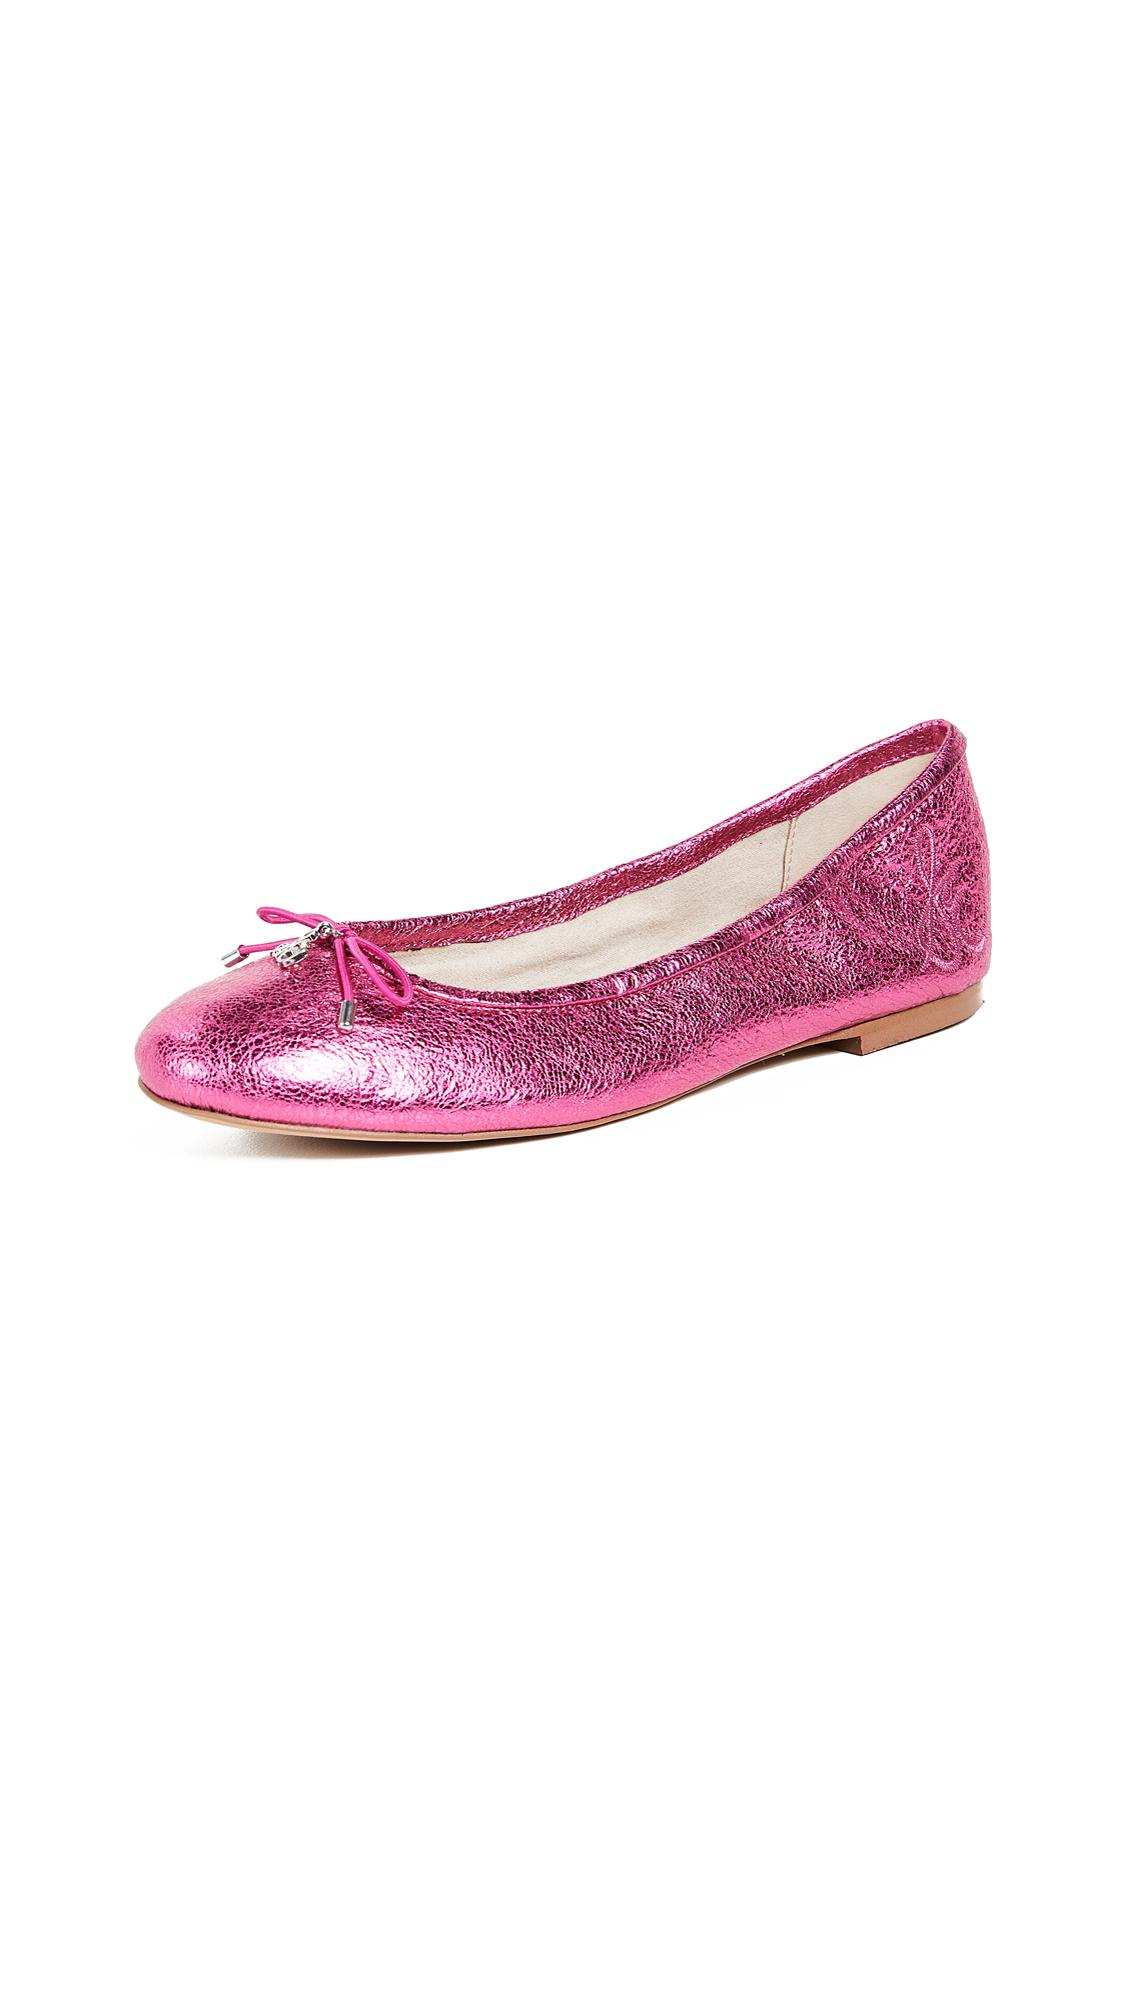 Sam Edelman Felicia Ballet Flats - Pomegranate Pink